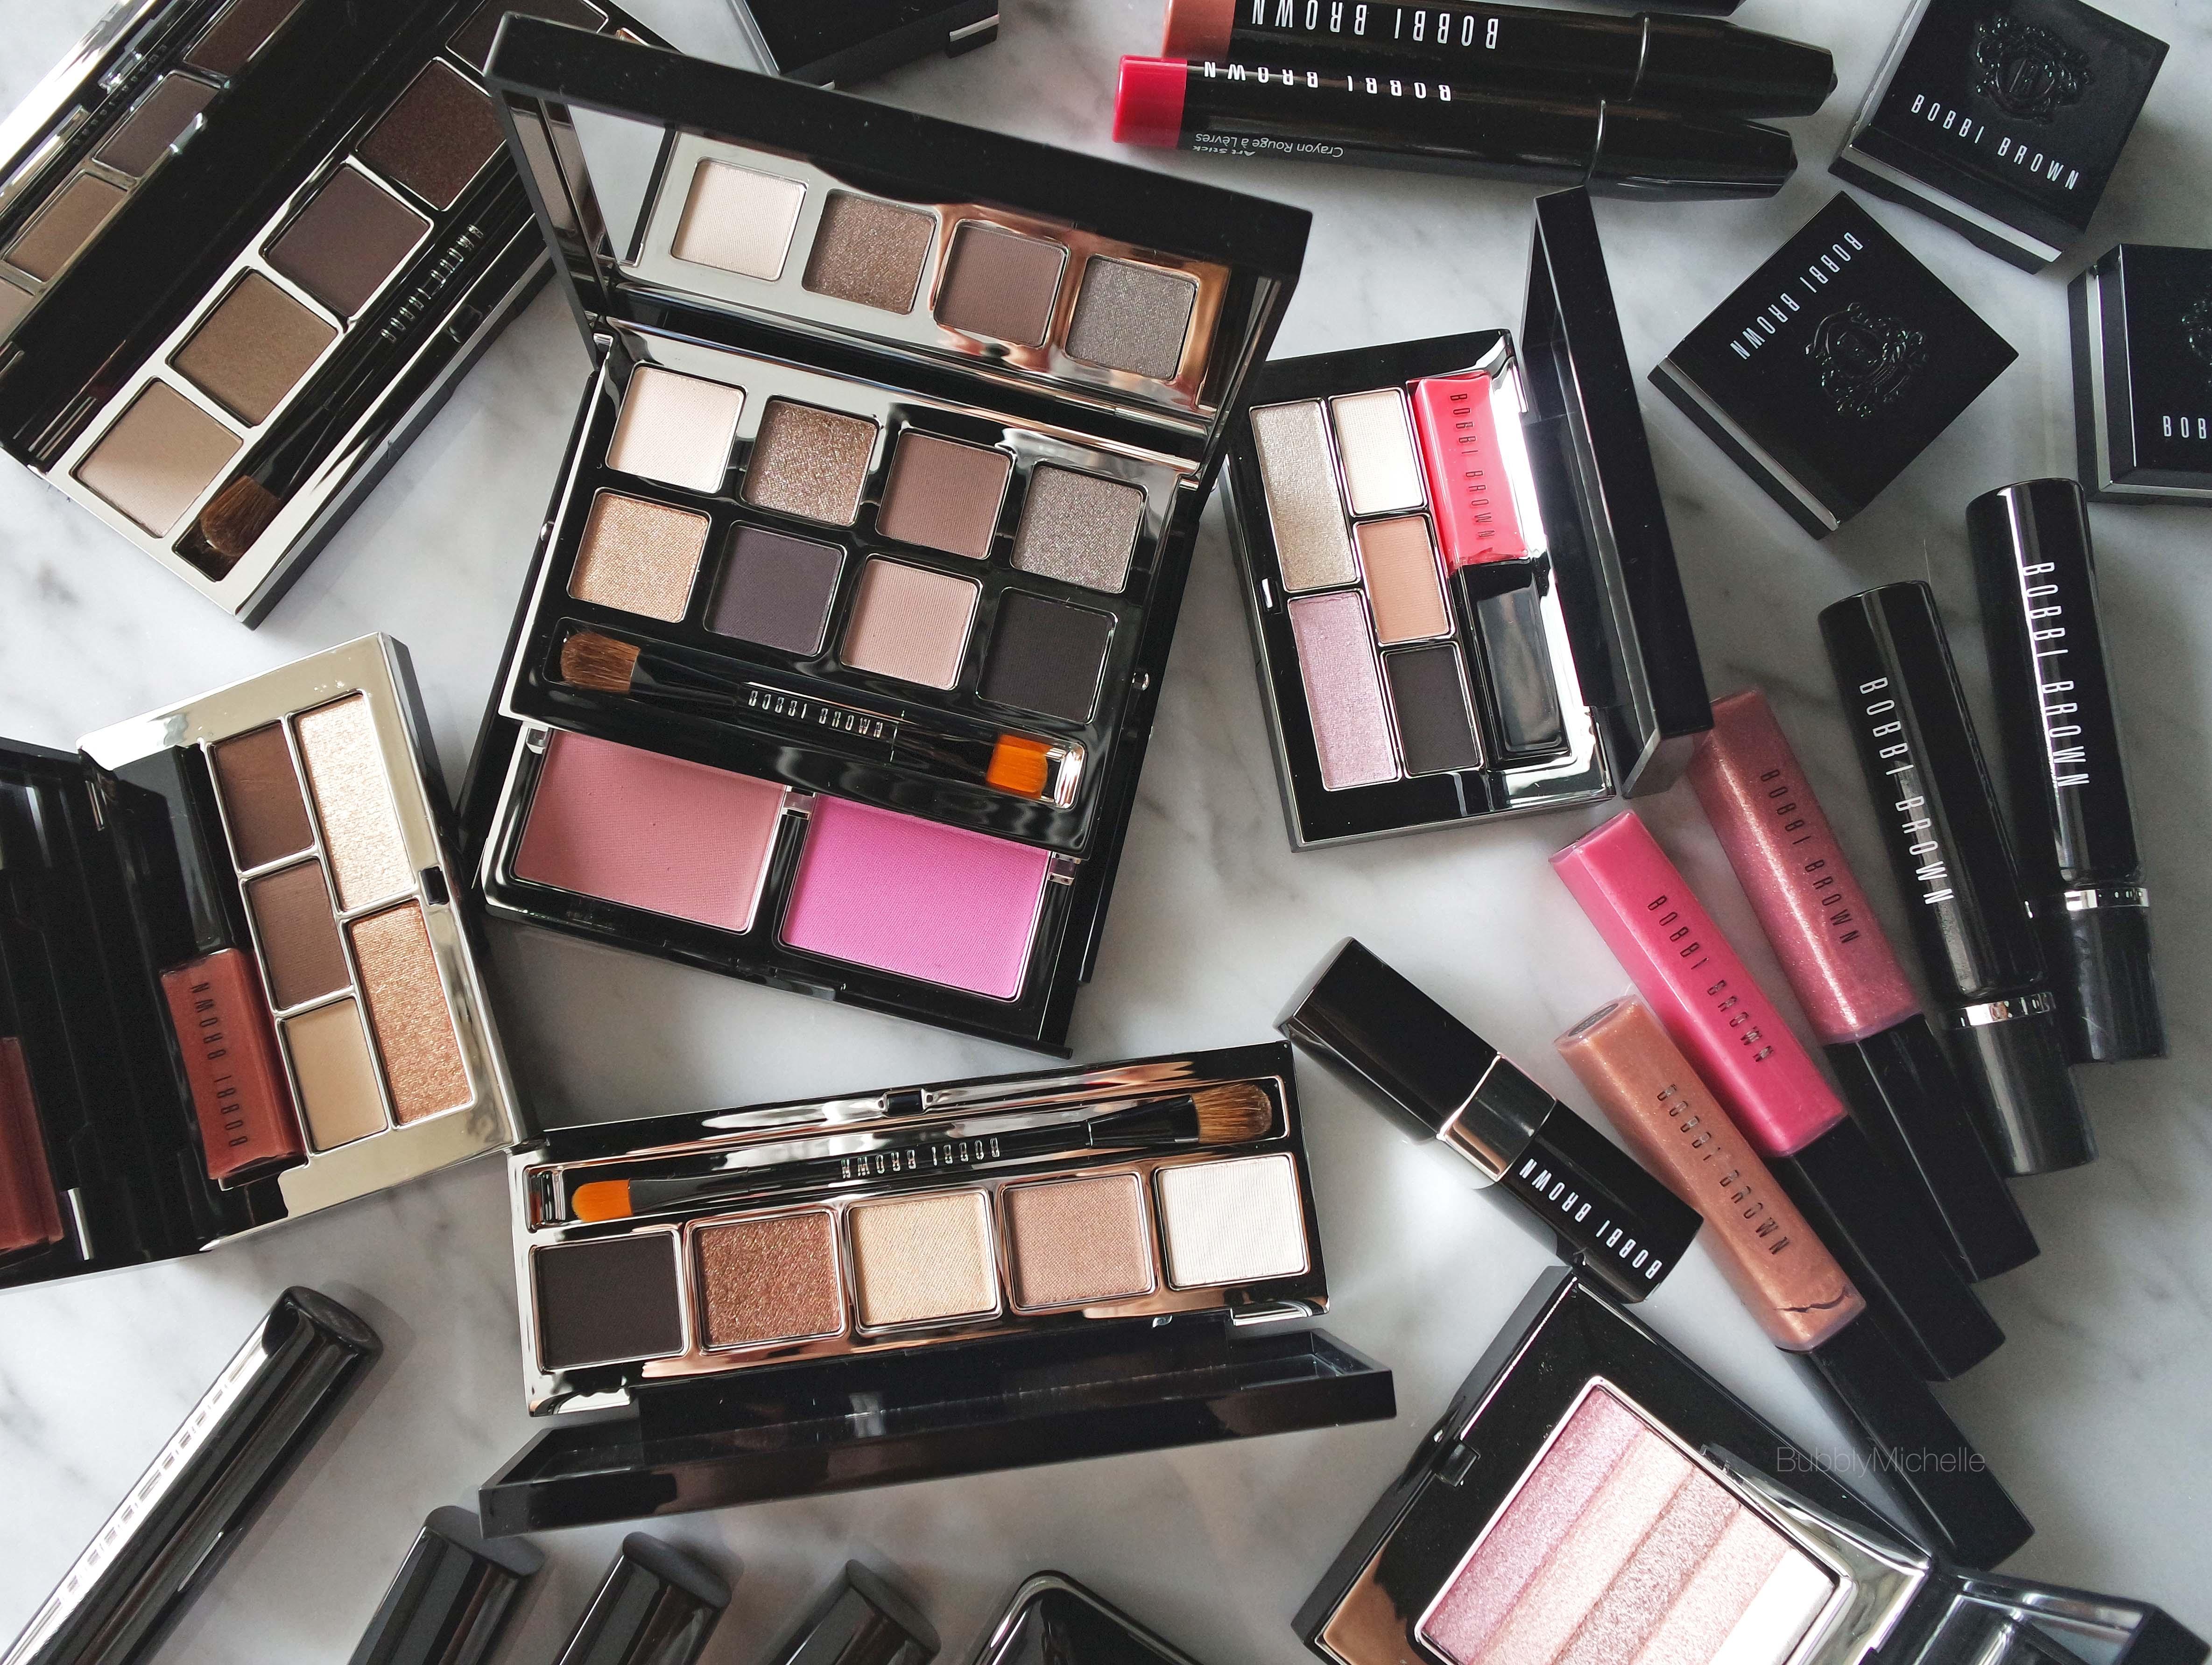 Bobbi Brown Holiday 2015 Makeup Collection